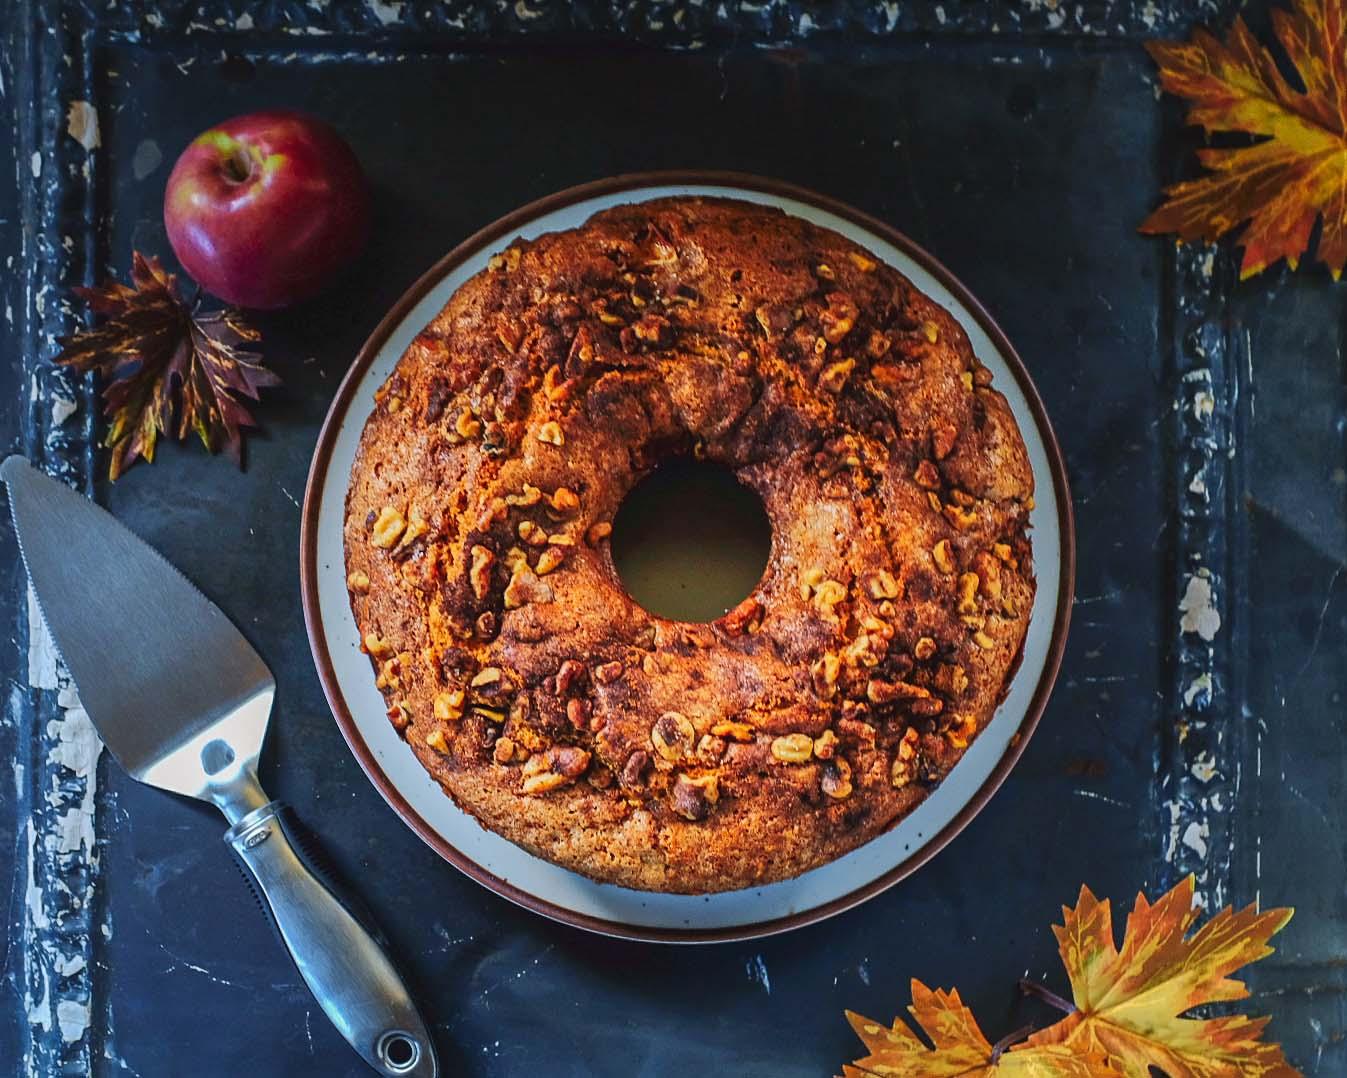 Maple Apple cake with serving utensil